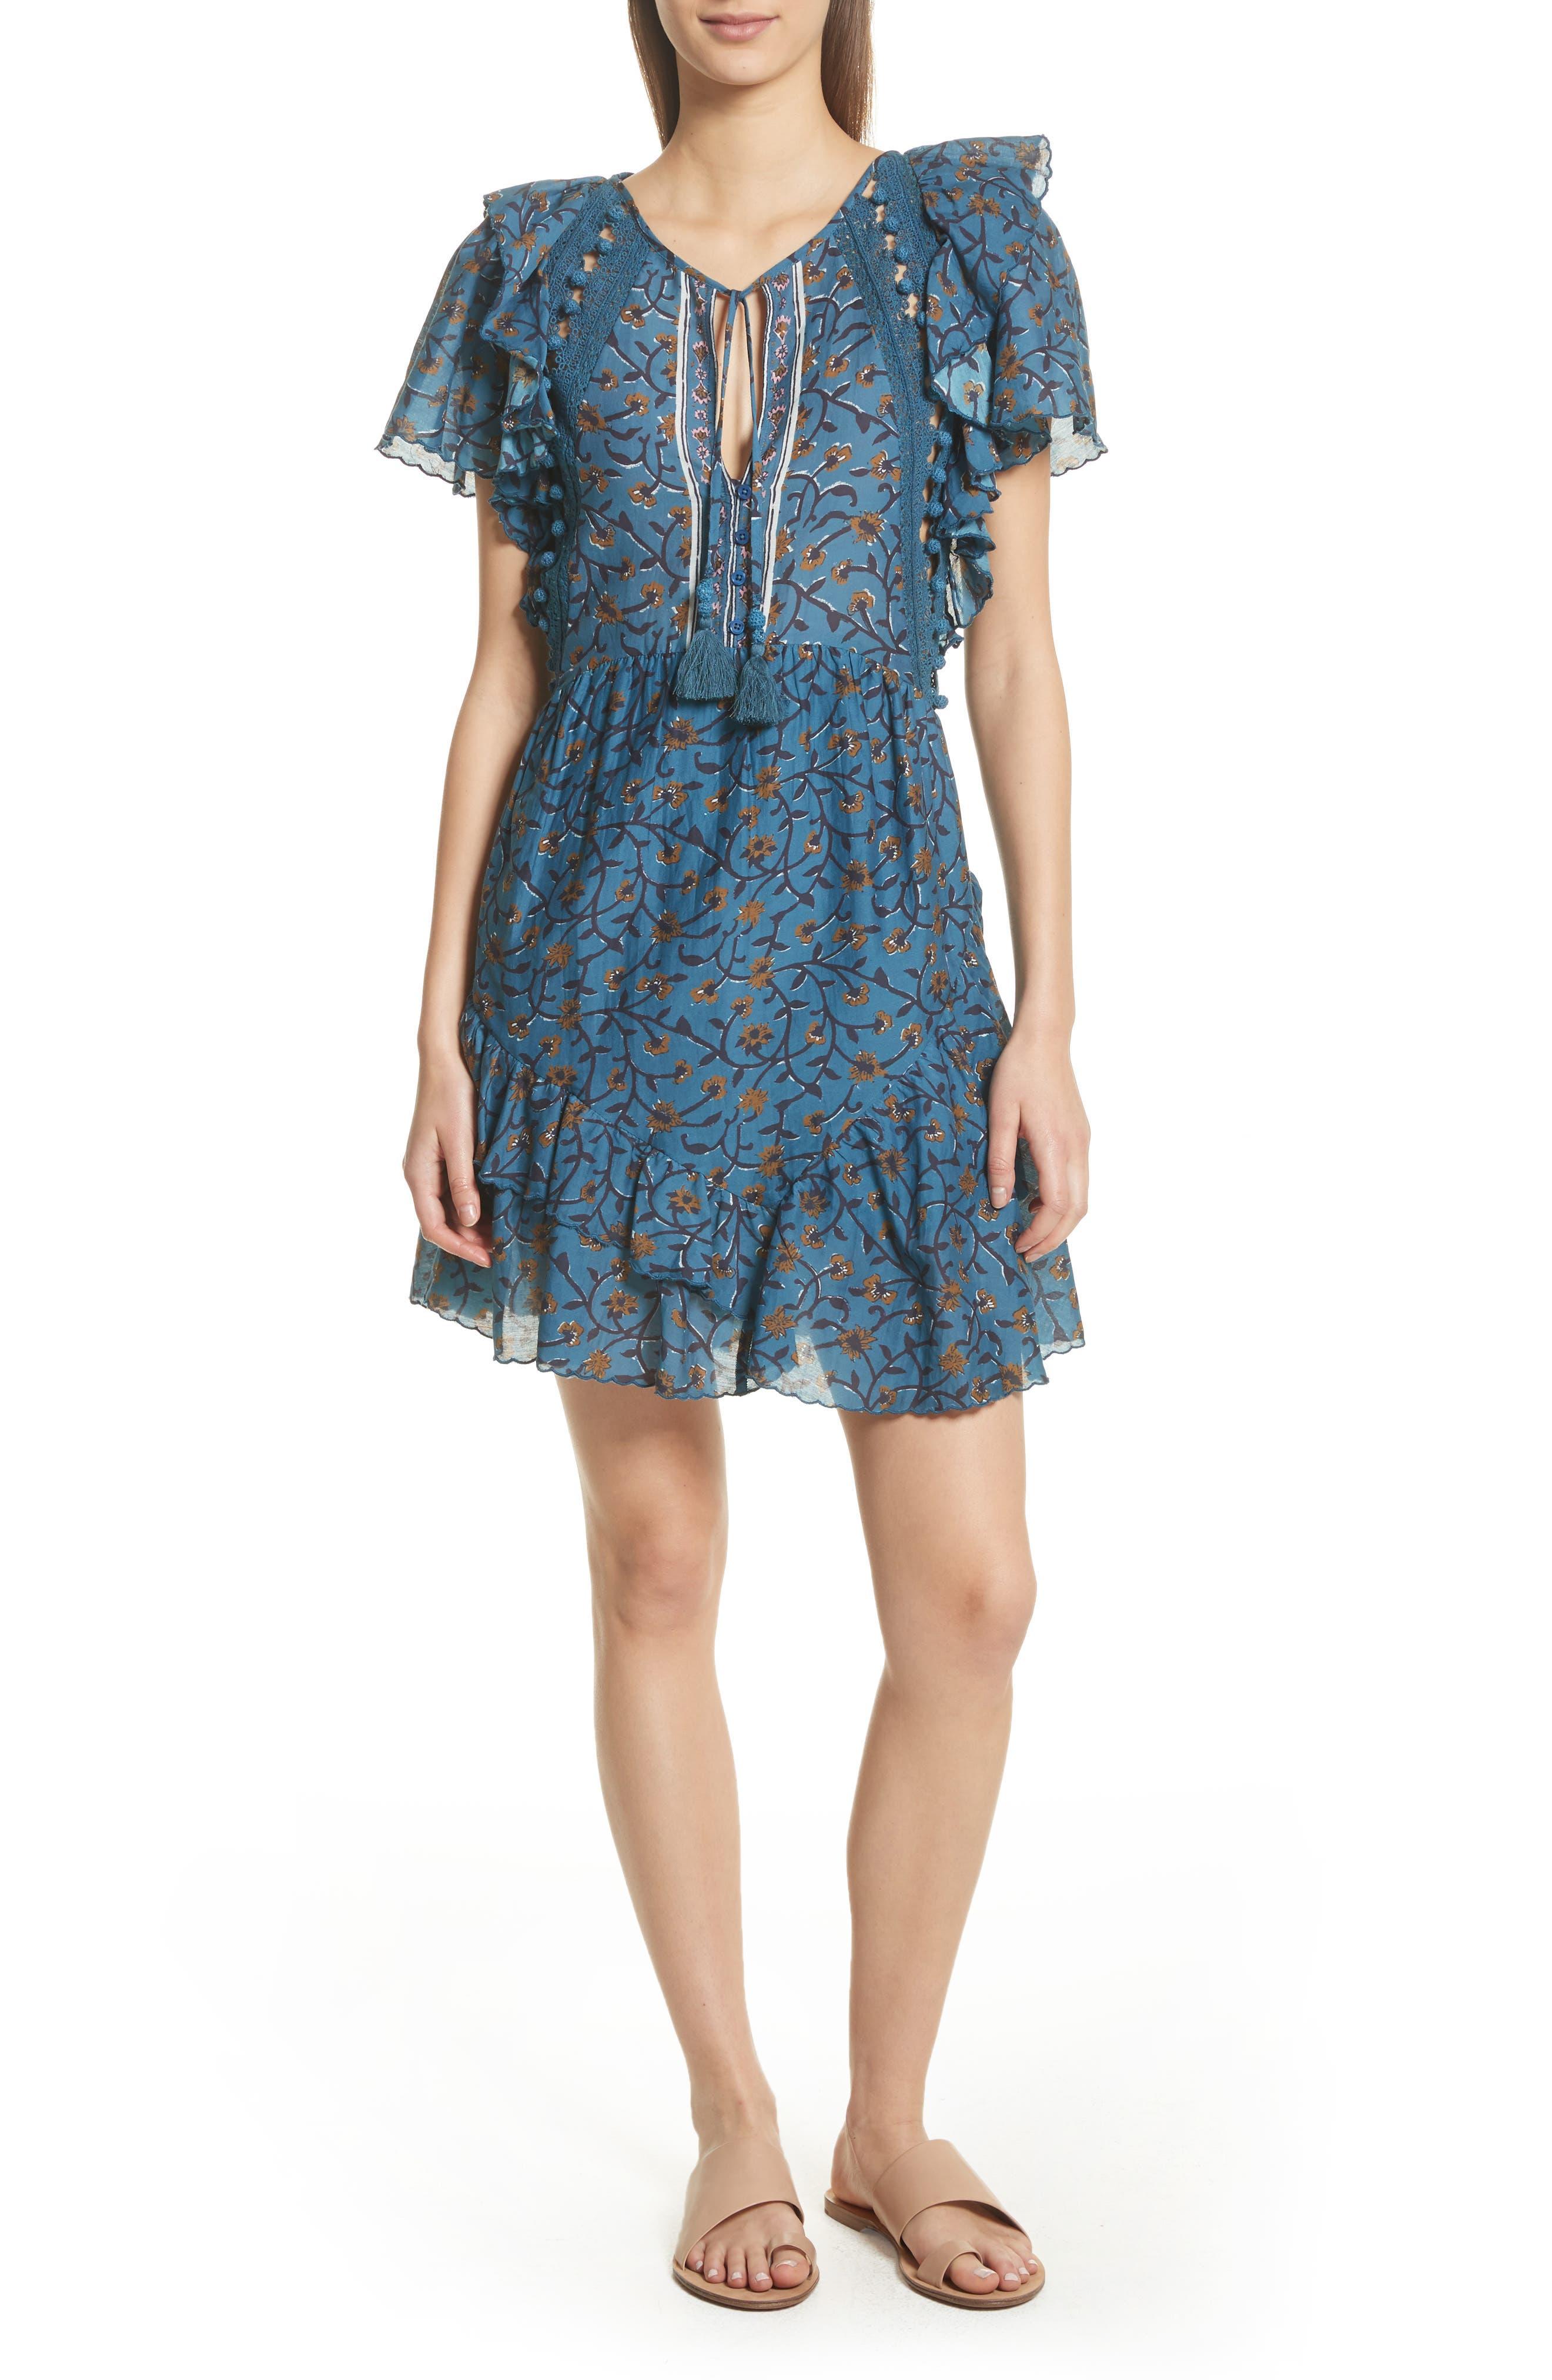 Kaylee Crochet Pompom Dress,                             Main thumbnail 1, color,                             Steel Blue